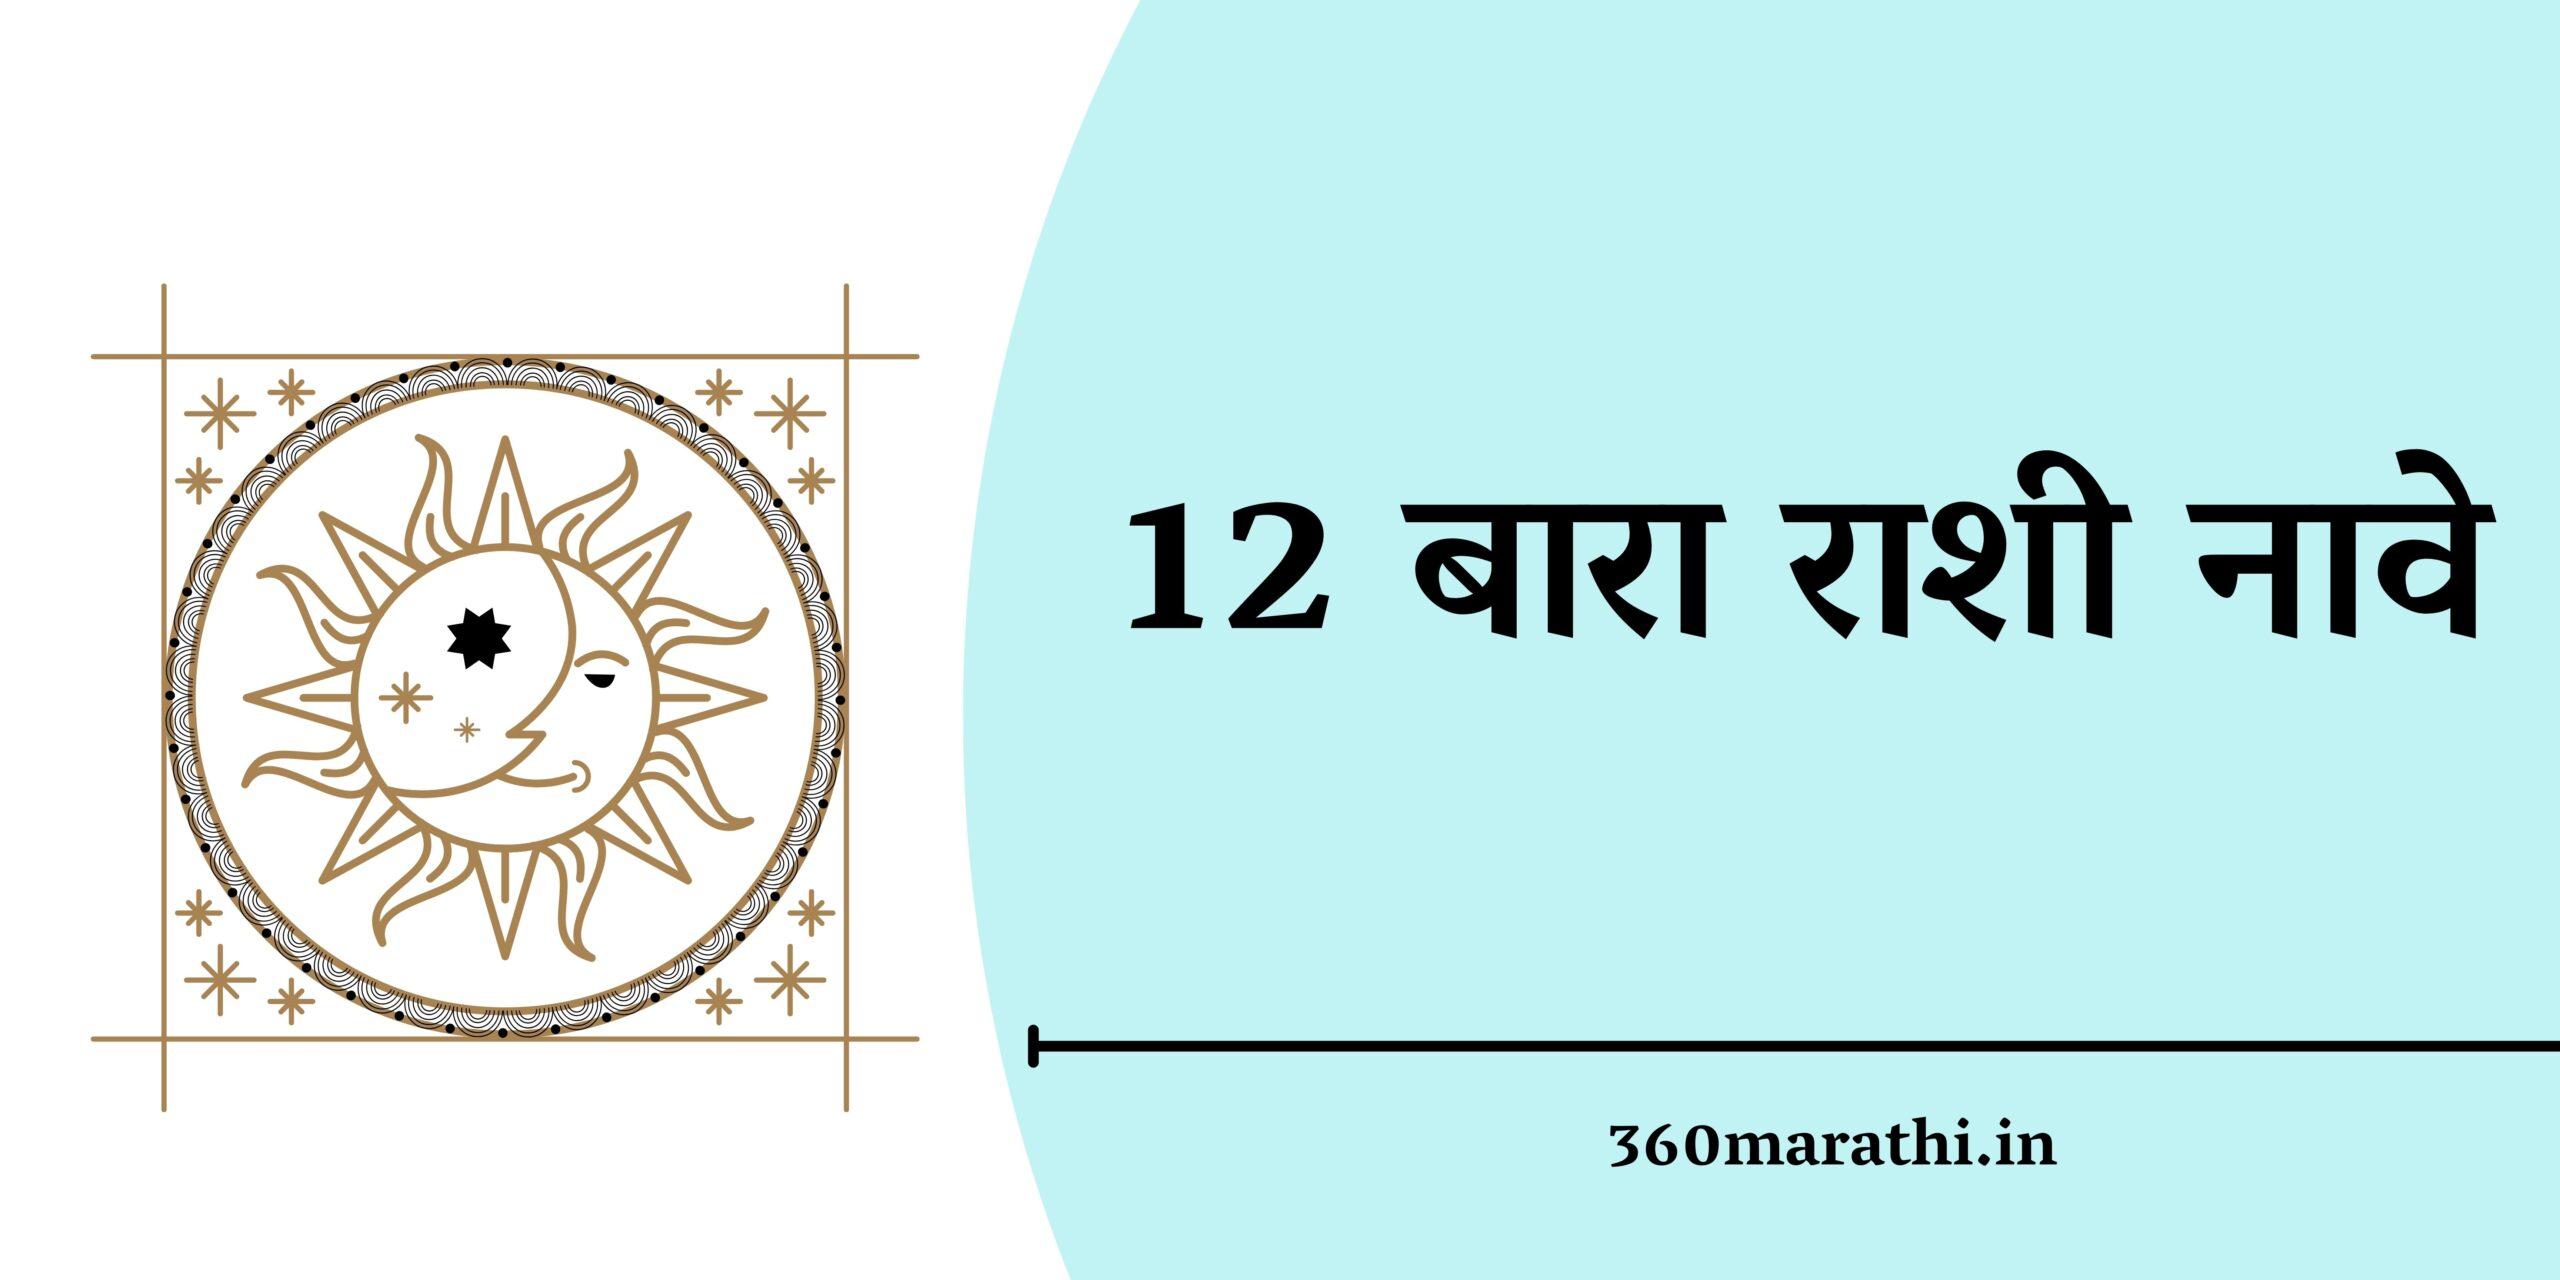 12 Zodiac Signs in Marathi & English | बारा राशींची मराठी आणि इंग्रजी नावे | Rashi Names in Marathi